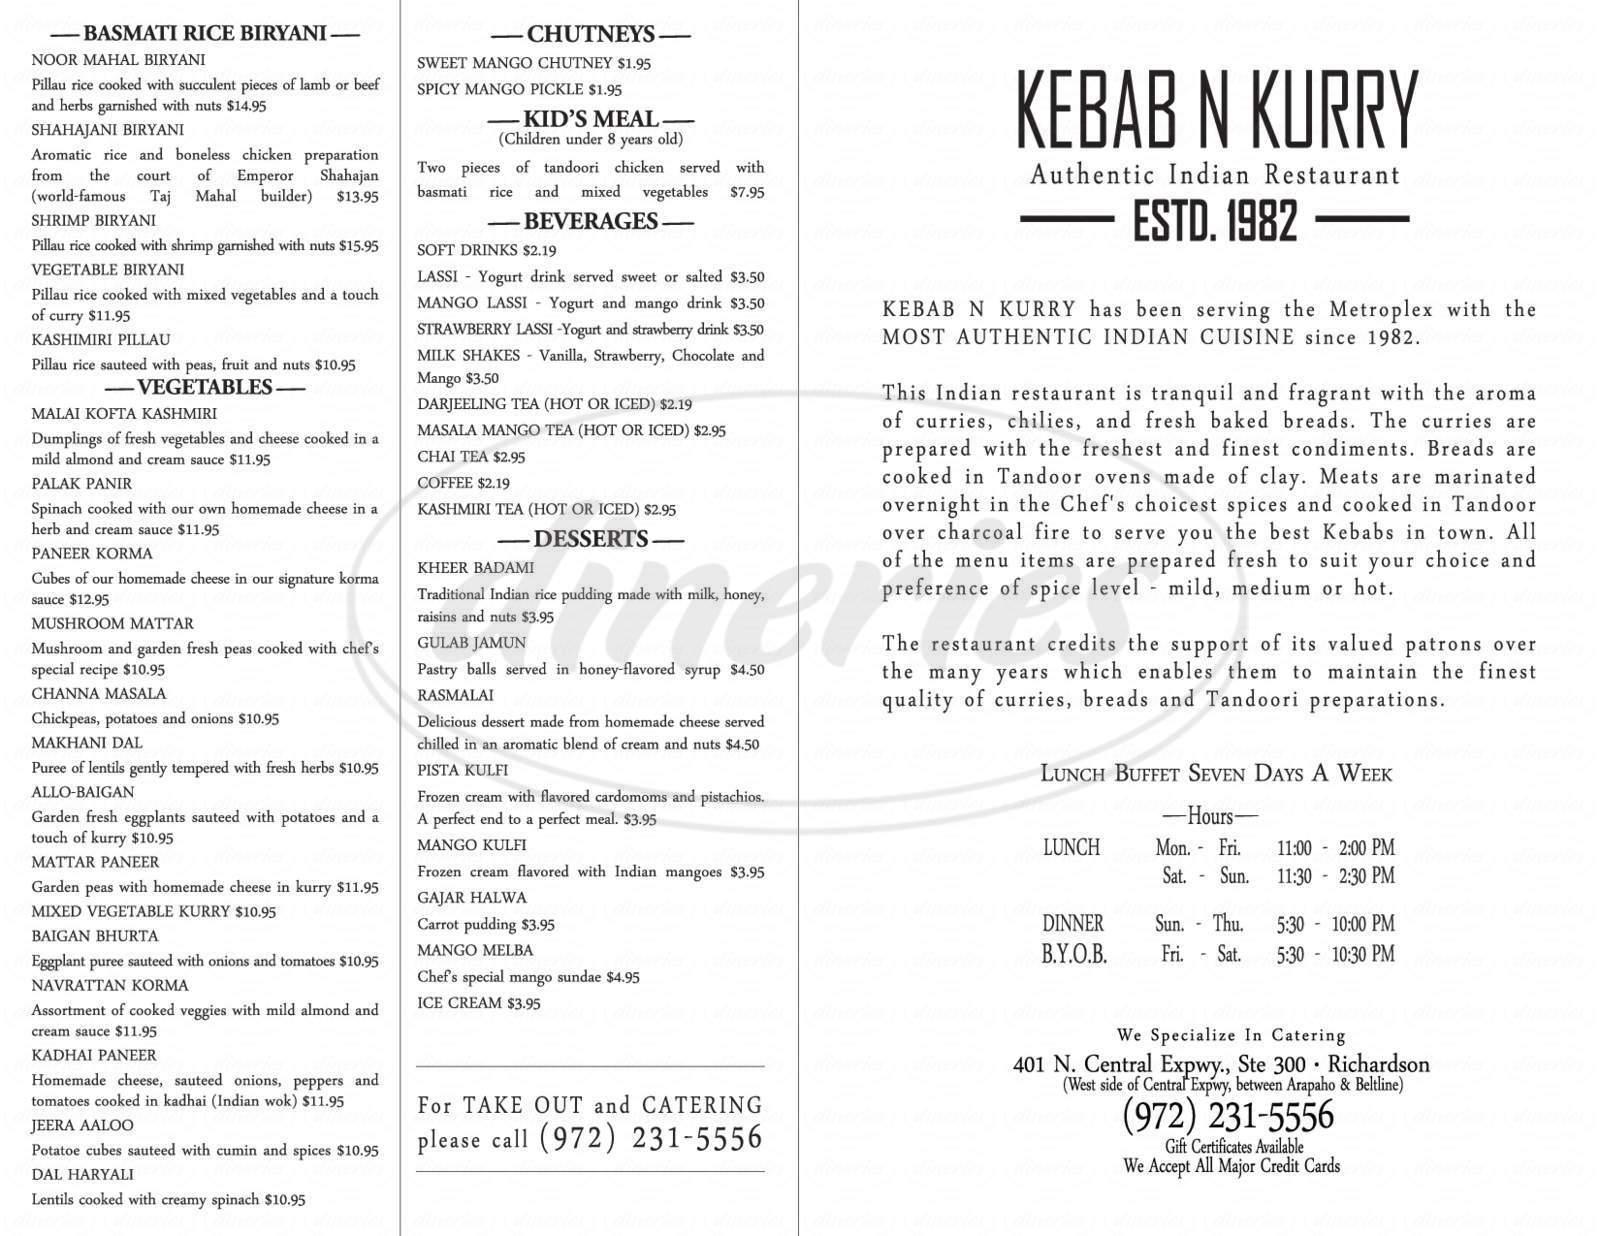 menu for Kebab-N-Kurry Indian Restaurant